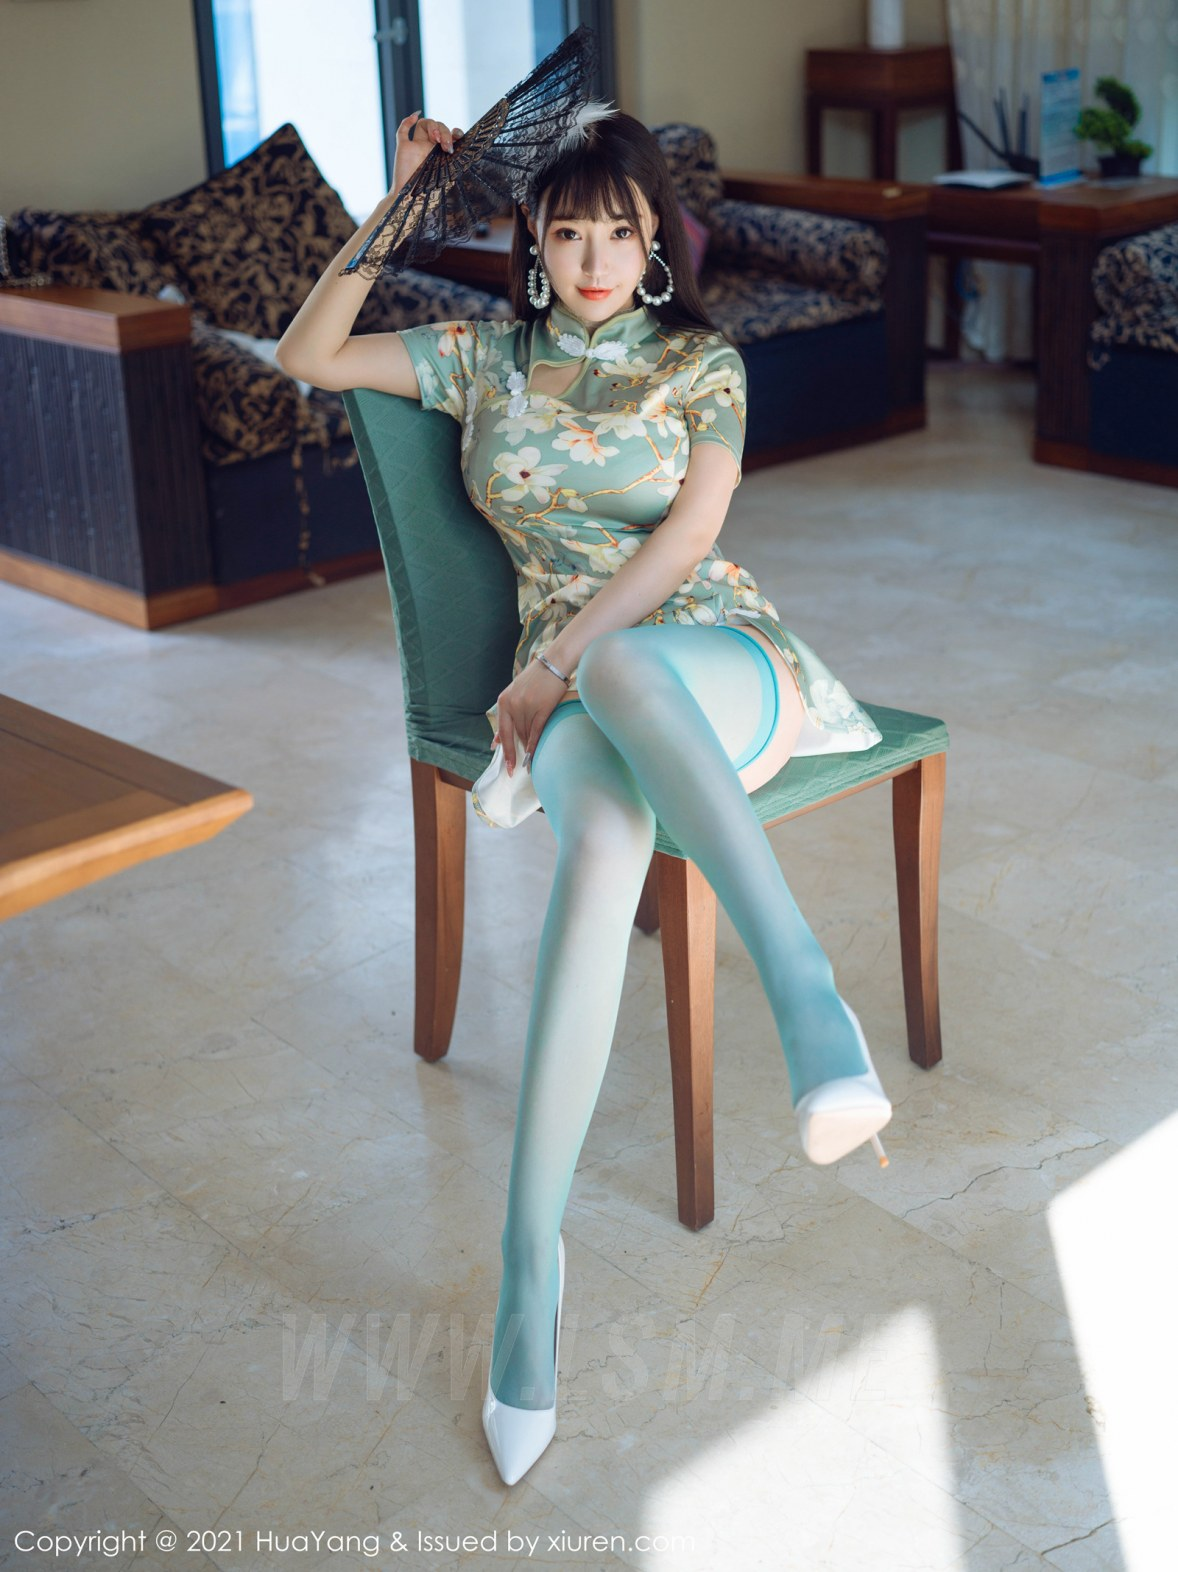 HuaYang 花漾show Vol.390 青瓷色旗袍 朱可儿Flower 三亚旅拍写真 - 2